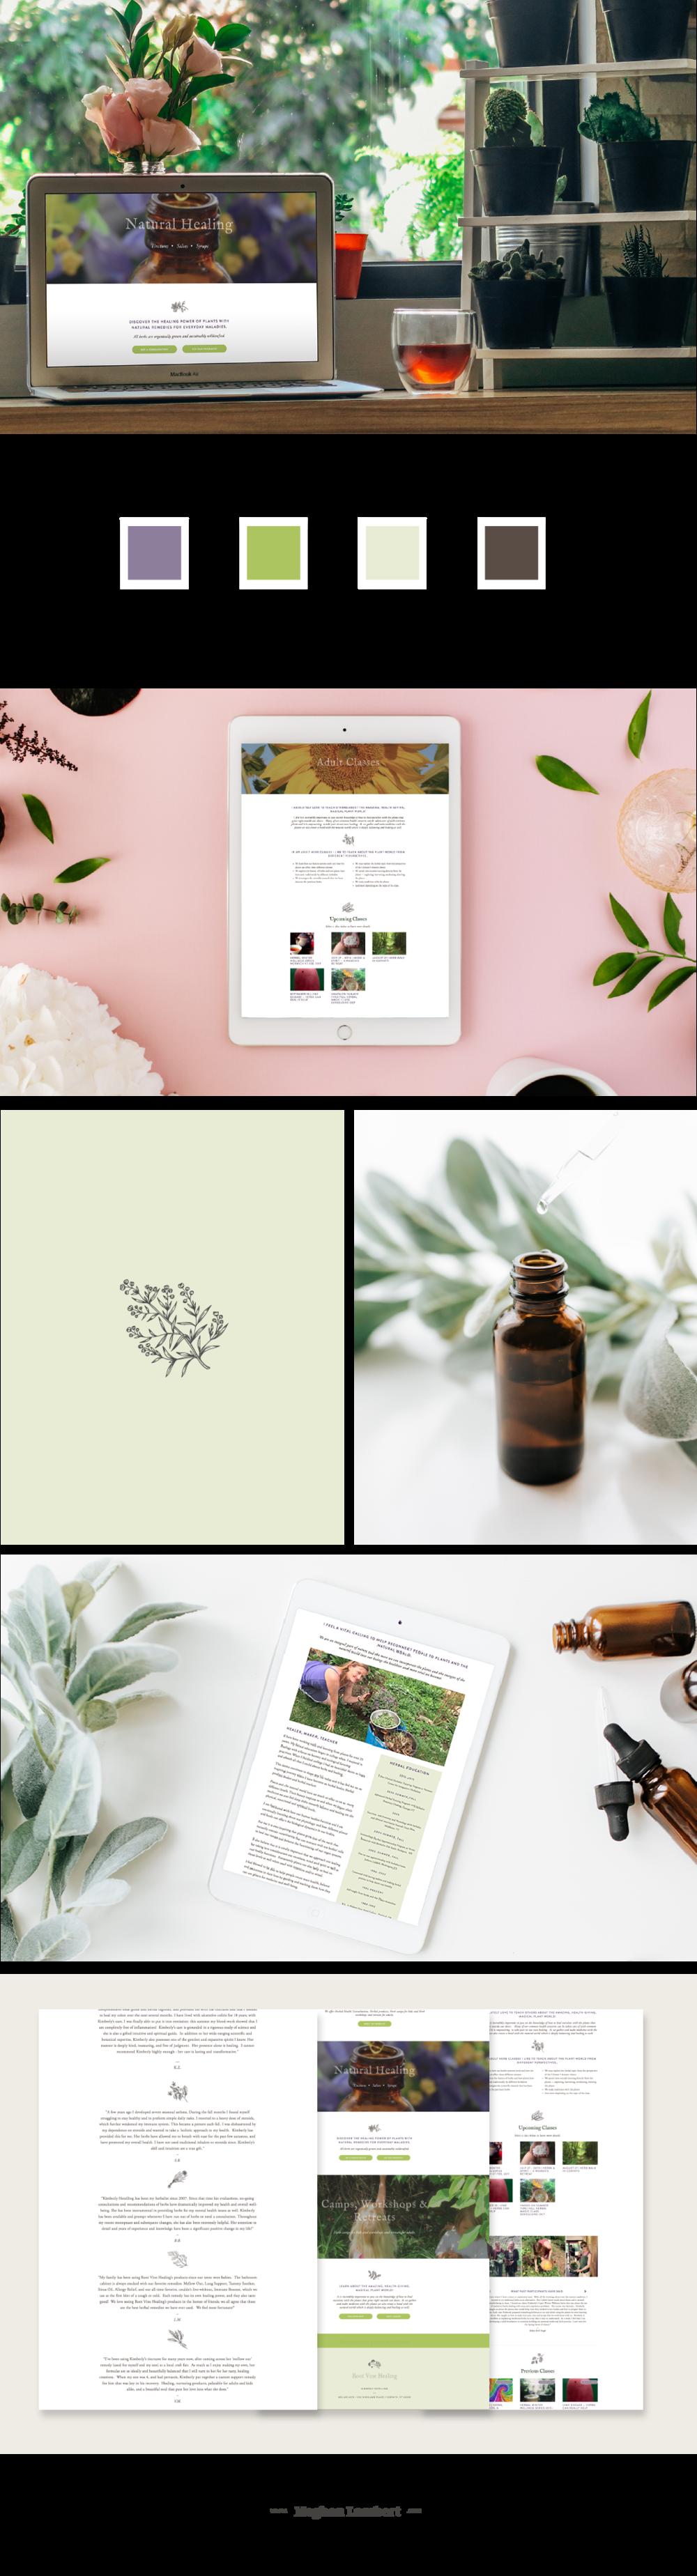 Root Vine Healing Squarespace Websit Designt by Meghan Lambert